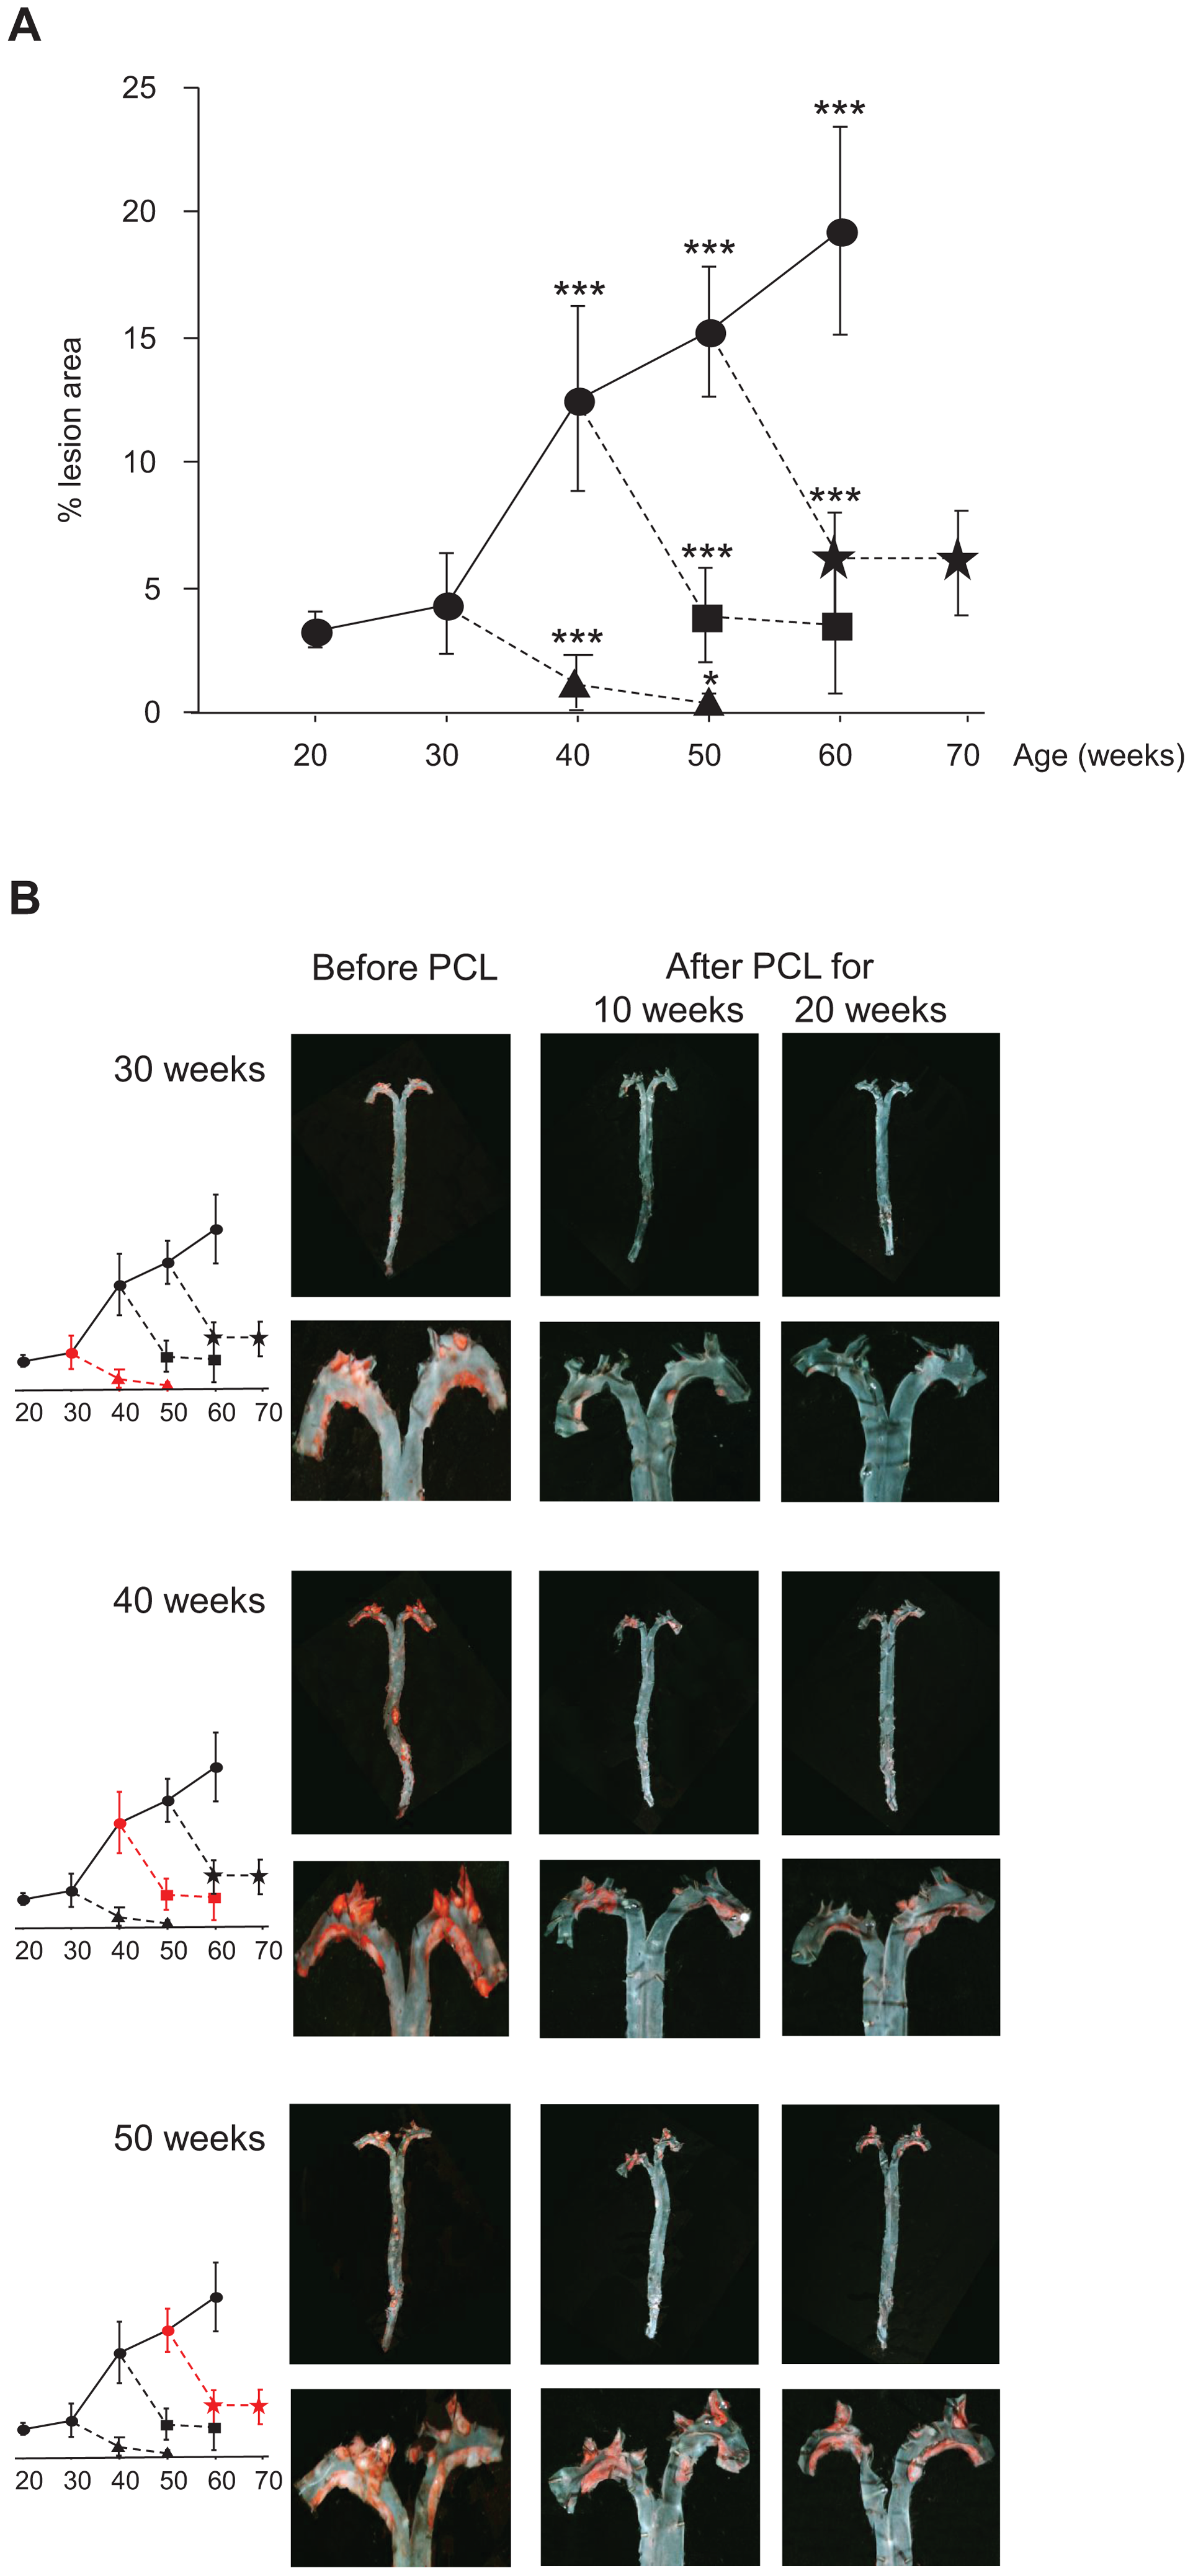 Atherosclerosis progression in <i>Ldlr<sup>−/−</sup>Apob</i><sup>100/100</sup><i>Mttp</i><sup>flox/flox</sup> mice and regression in <i>Ldlr<sup>−/−</sup>Apob</i><sup>100/100</sup><i>Mttp</i><sup>Δ/Δ</sup> mice.